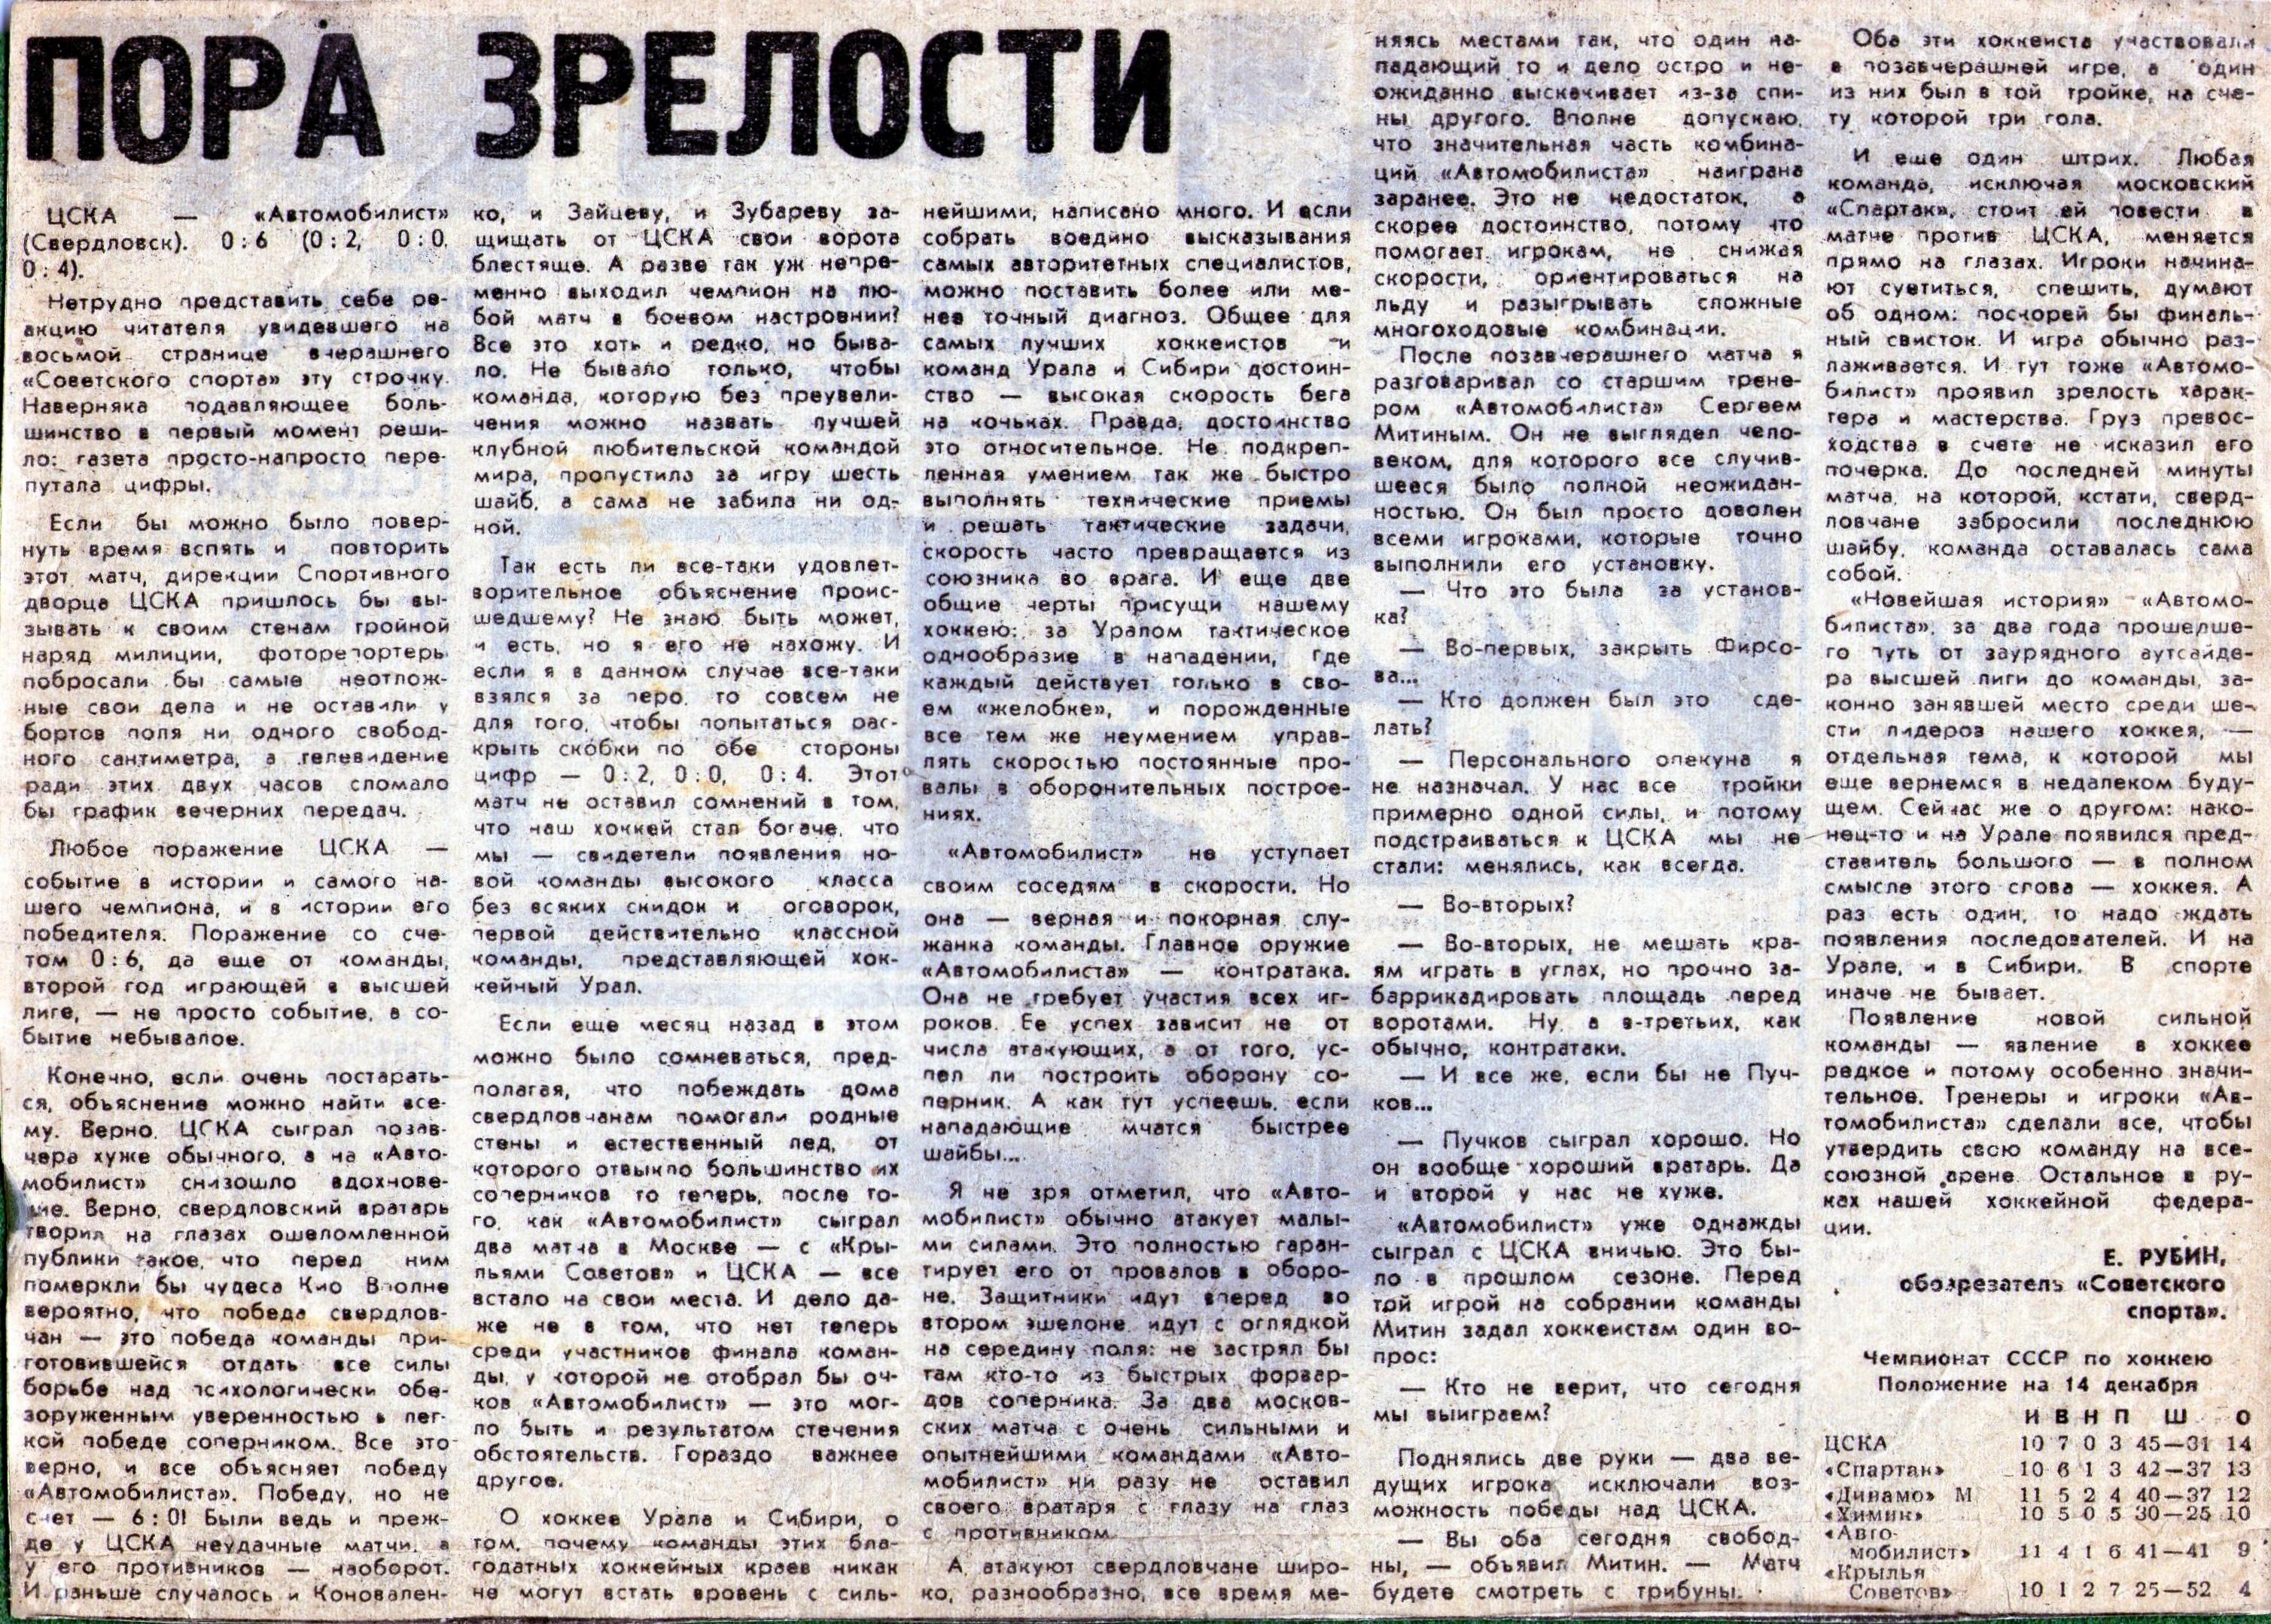 1968.12.12а ЦСКА 0-6 Автомобилист Св..jpg